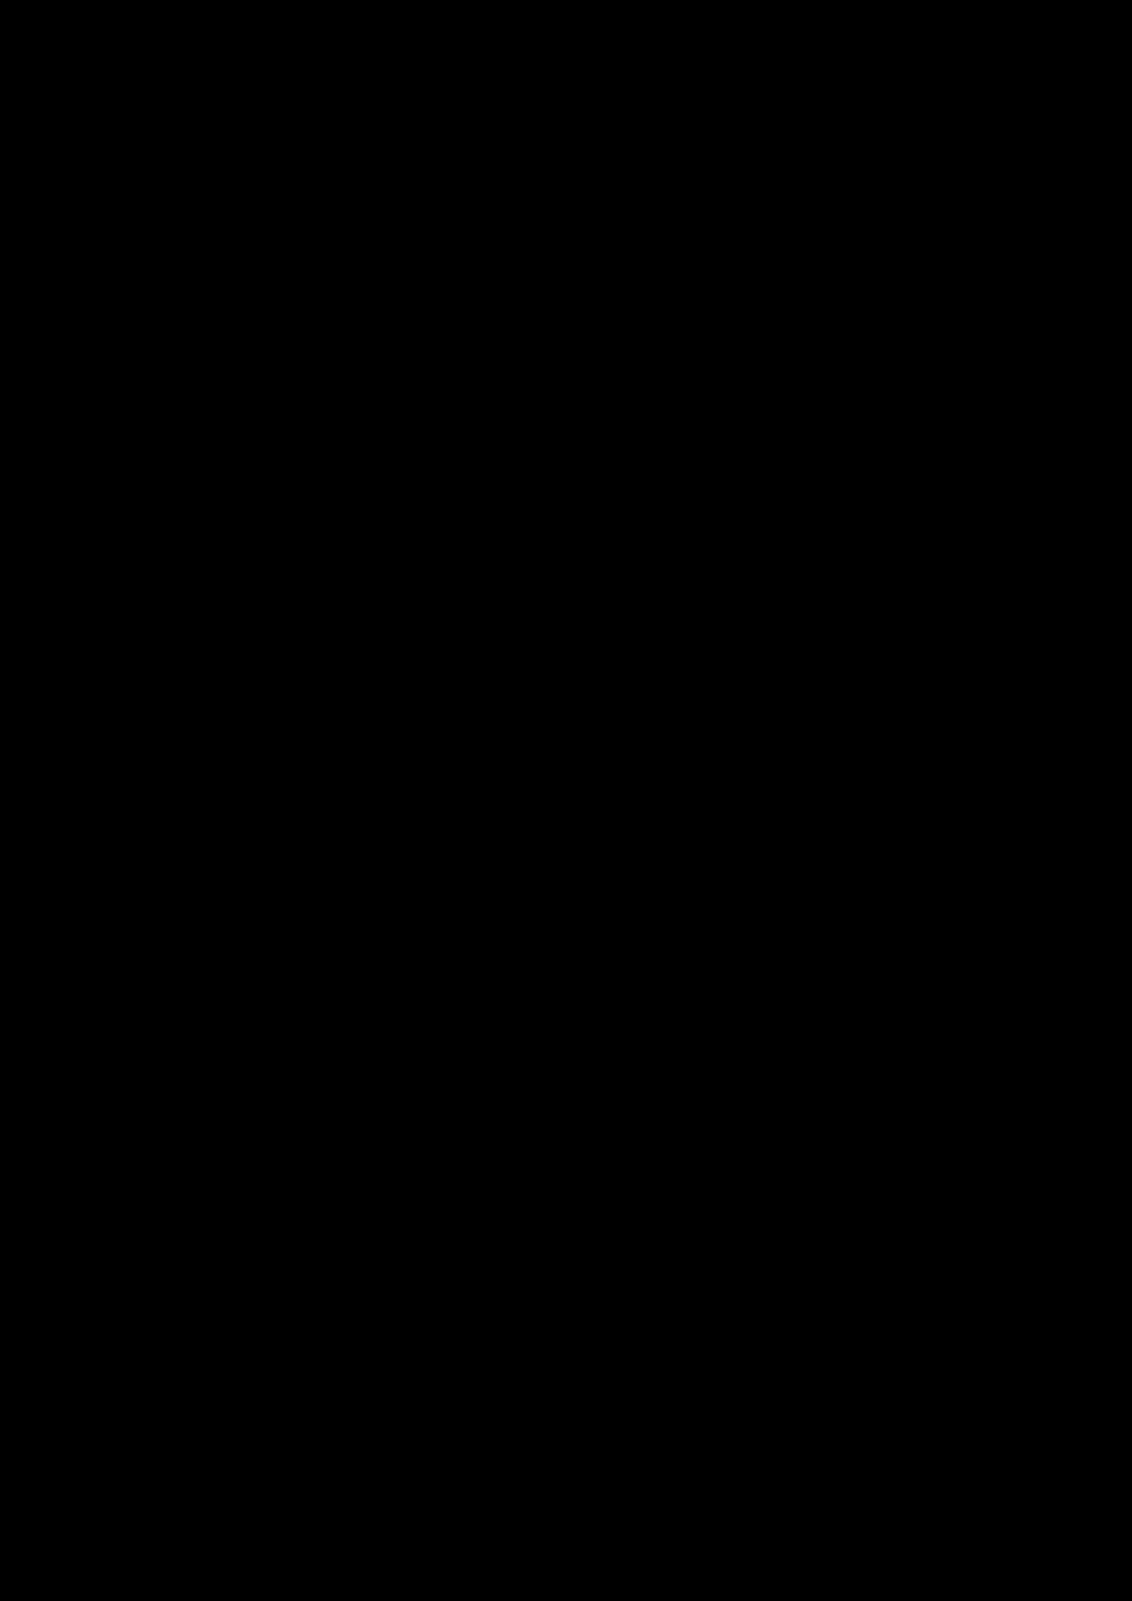 Prosti slide, Image 40